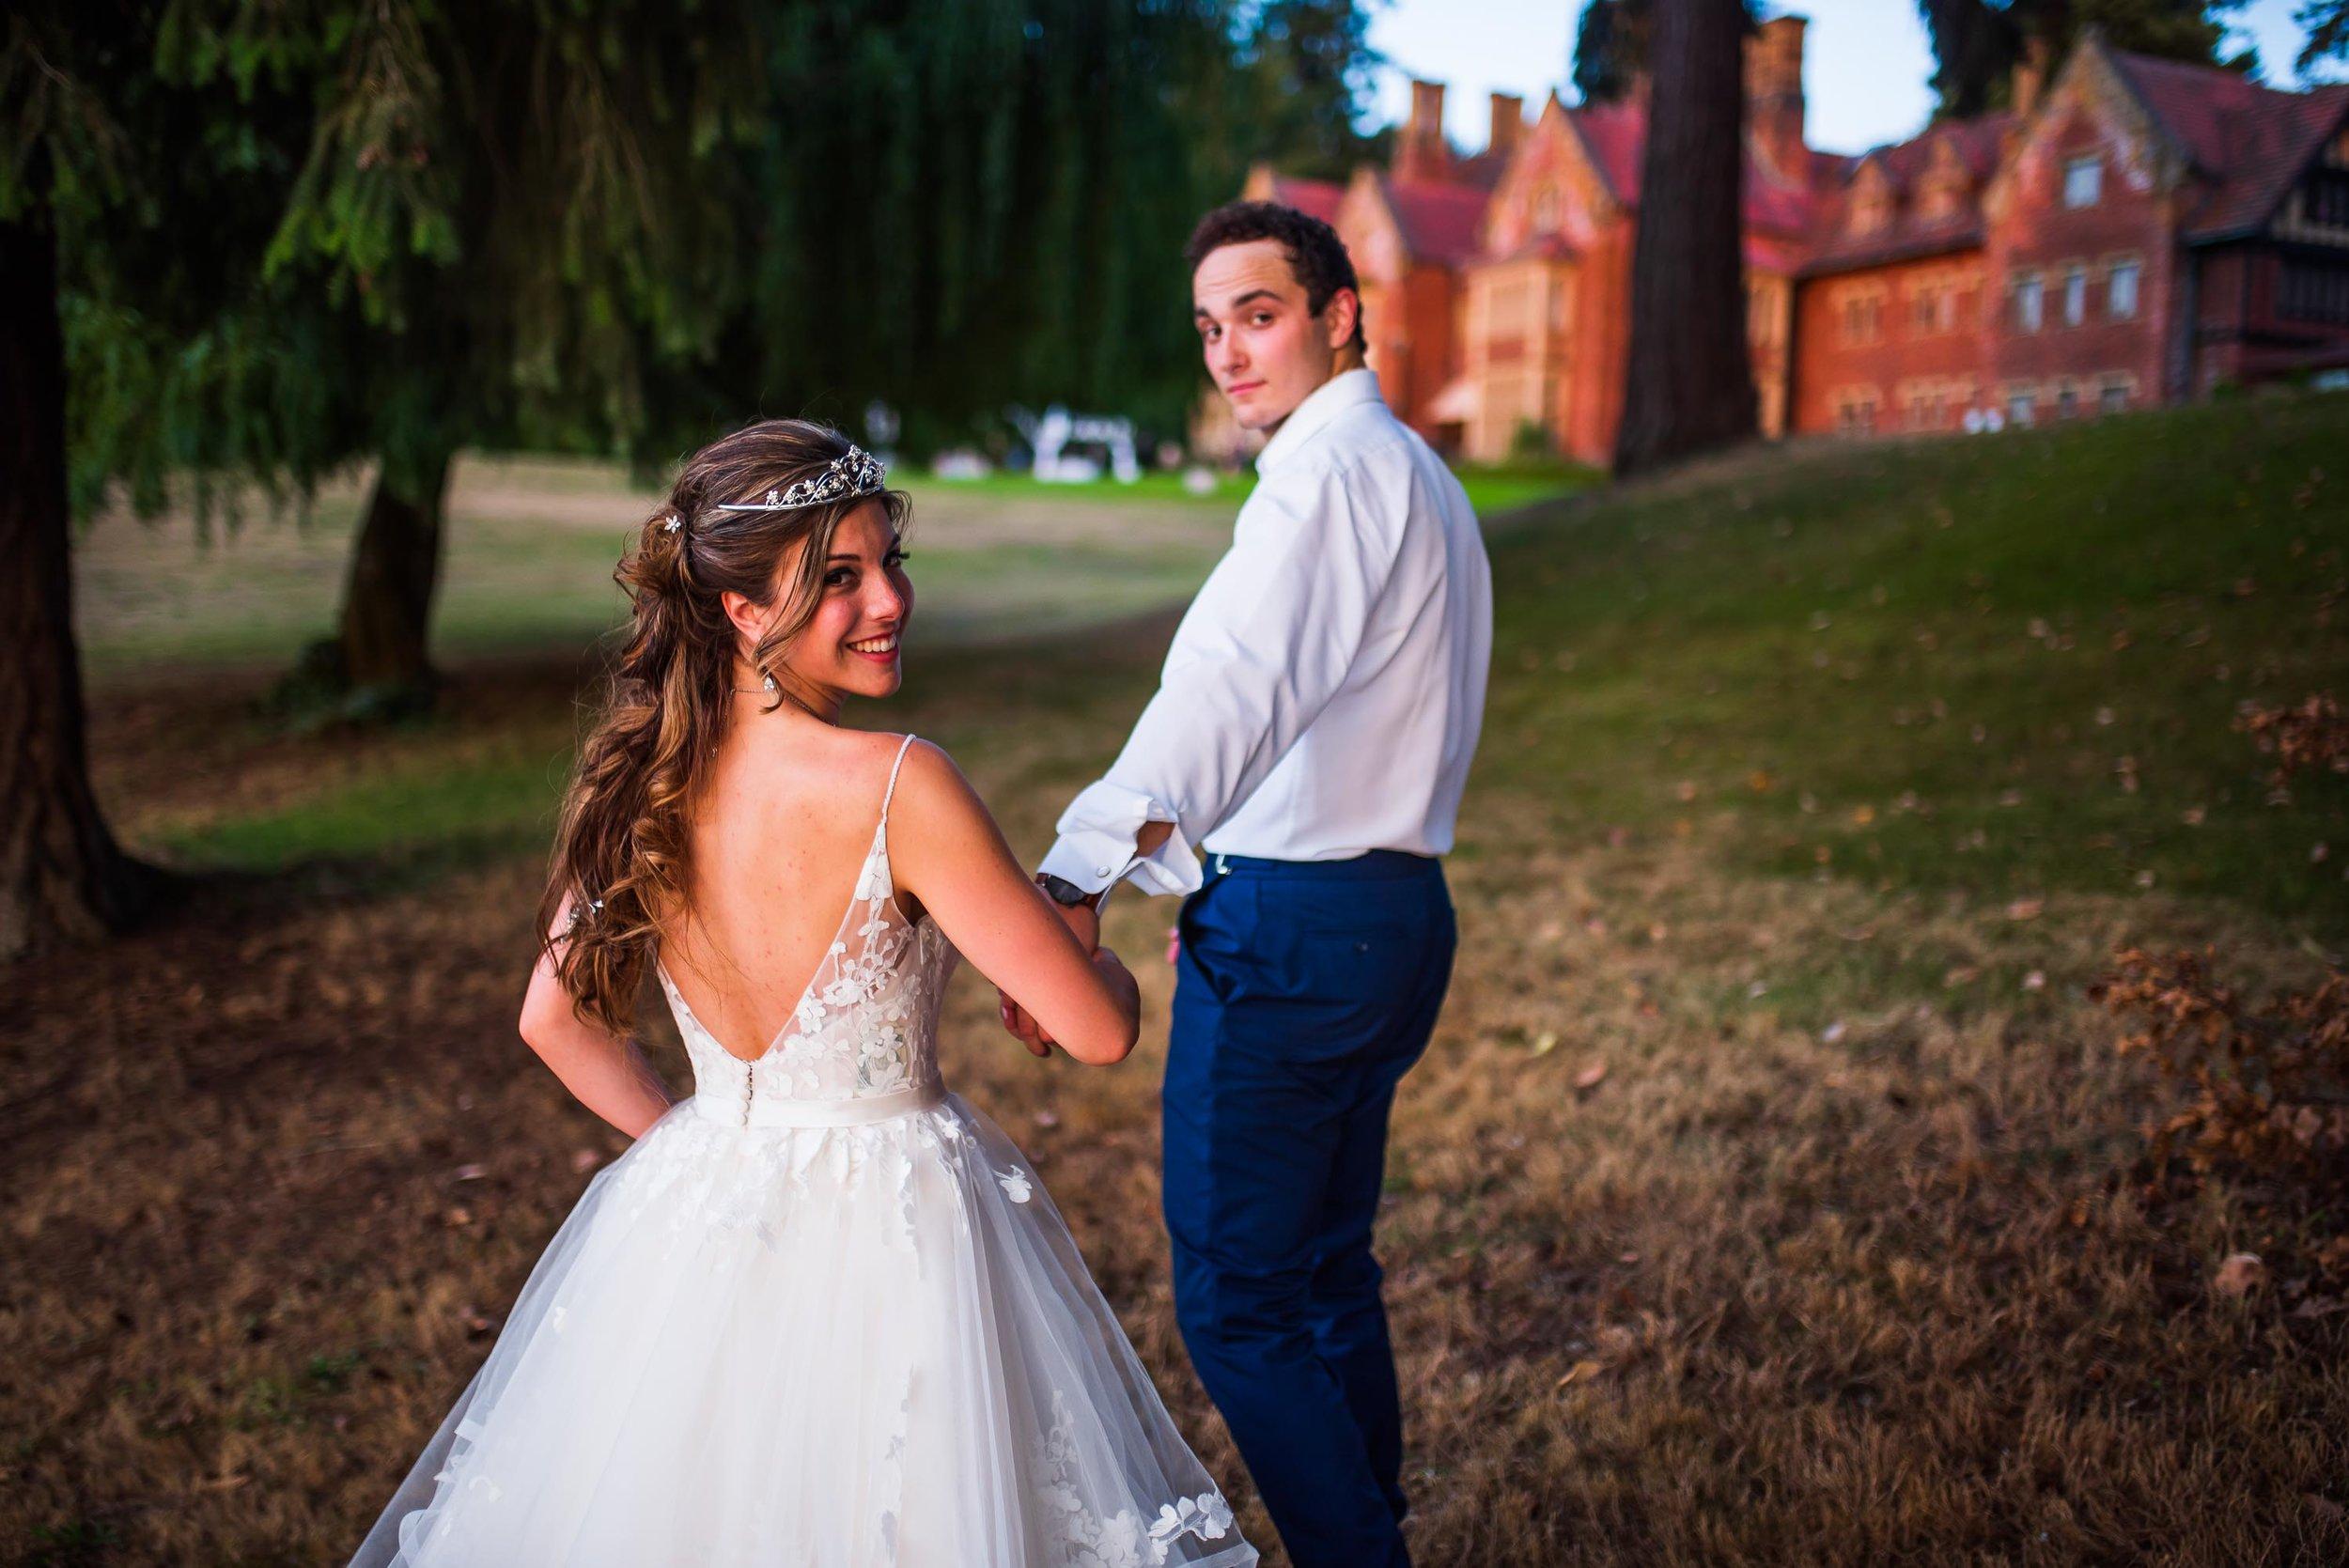 thornewood castle wedding 109.jpg